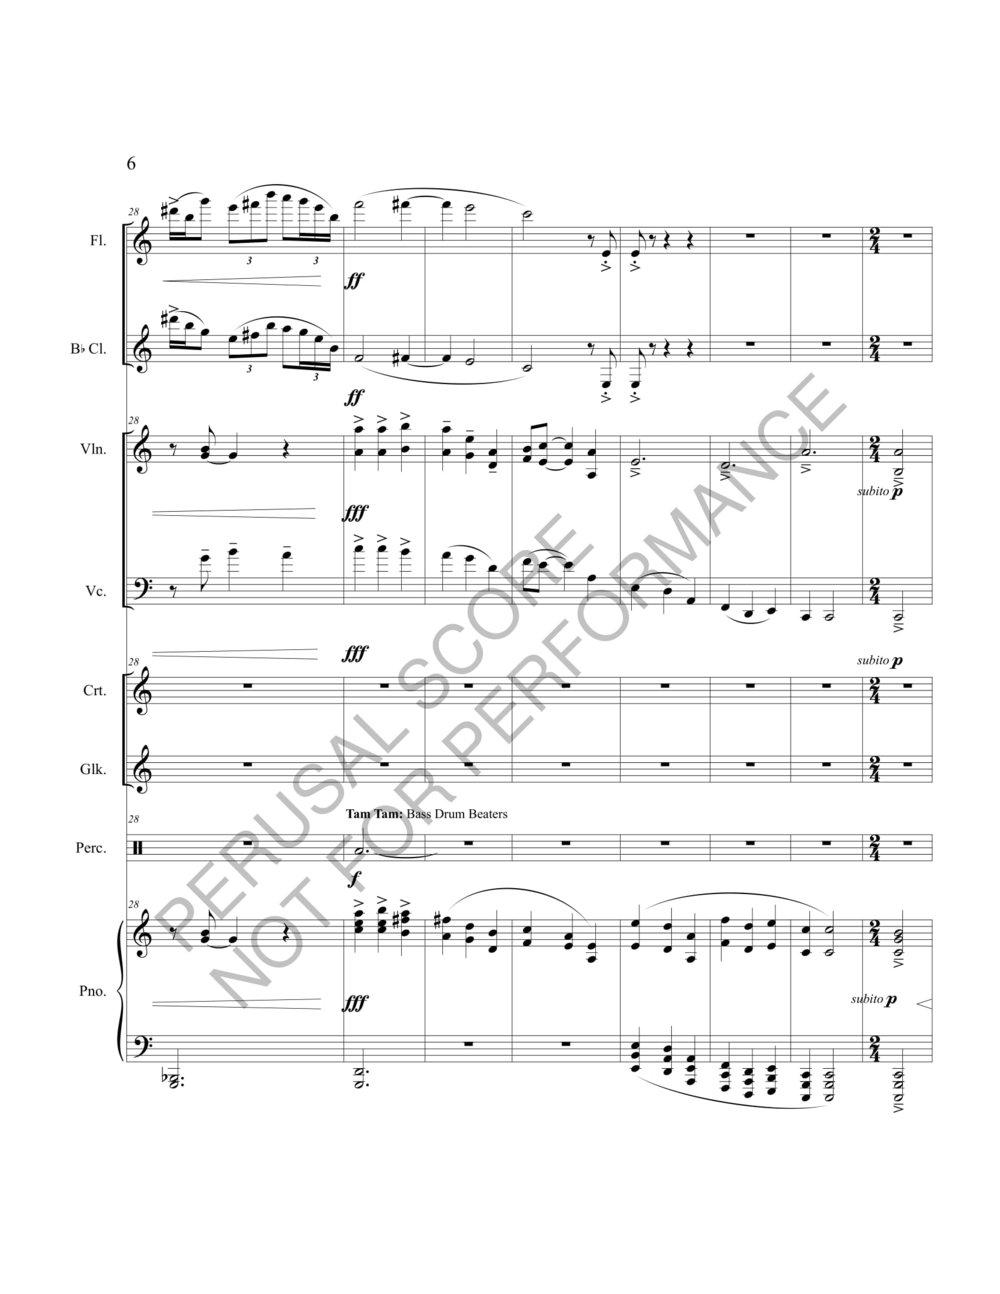 Boyd Terra Liberi Score-watermark-12.jpg